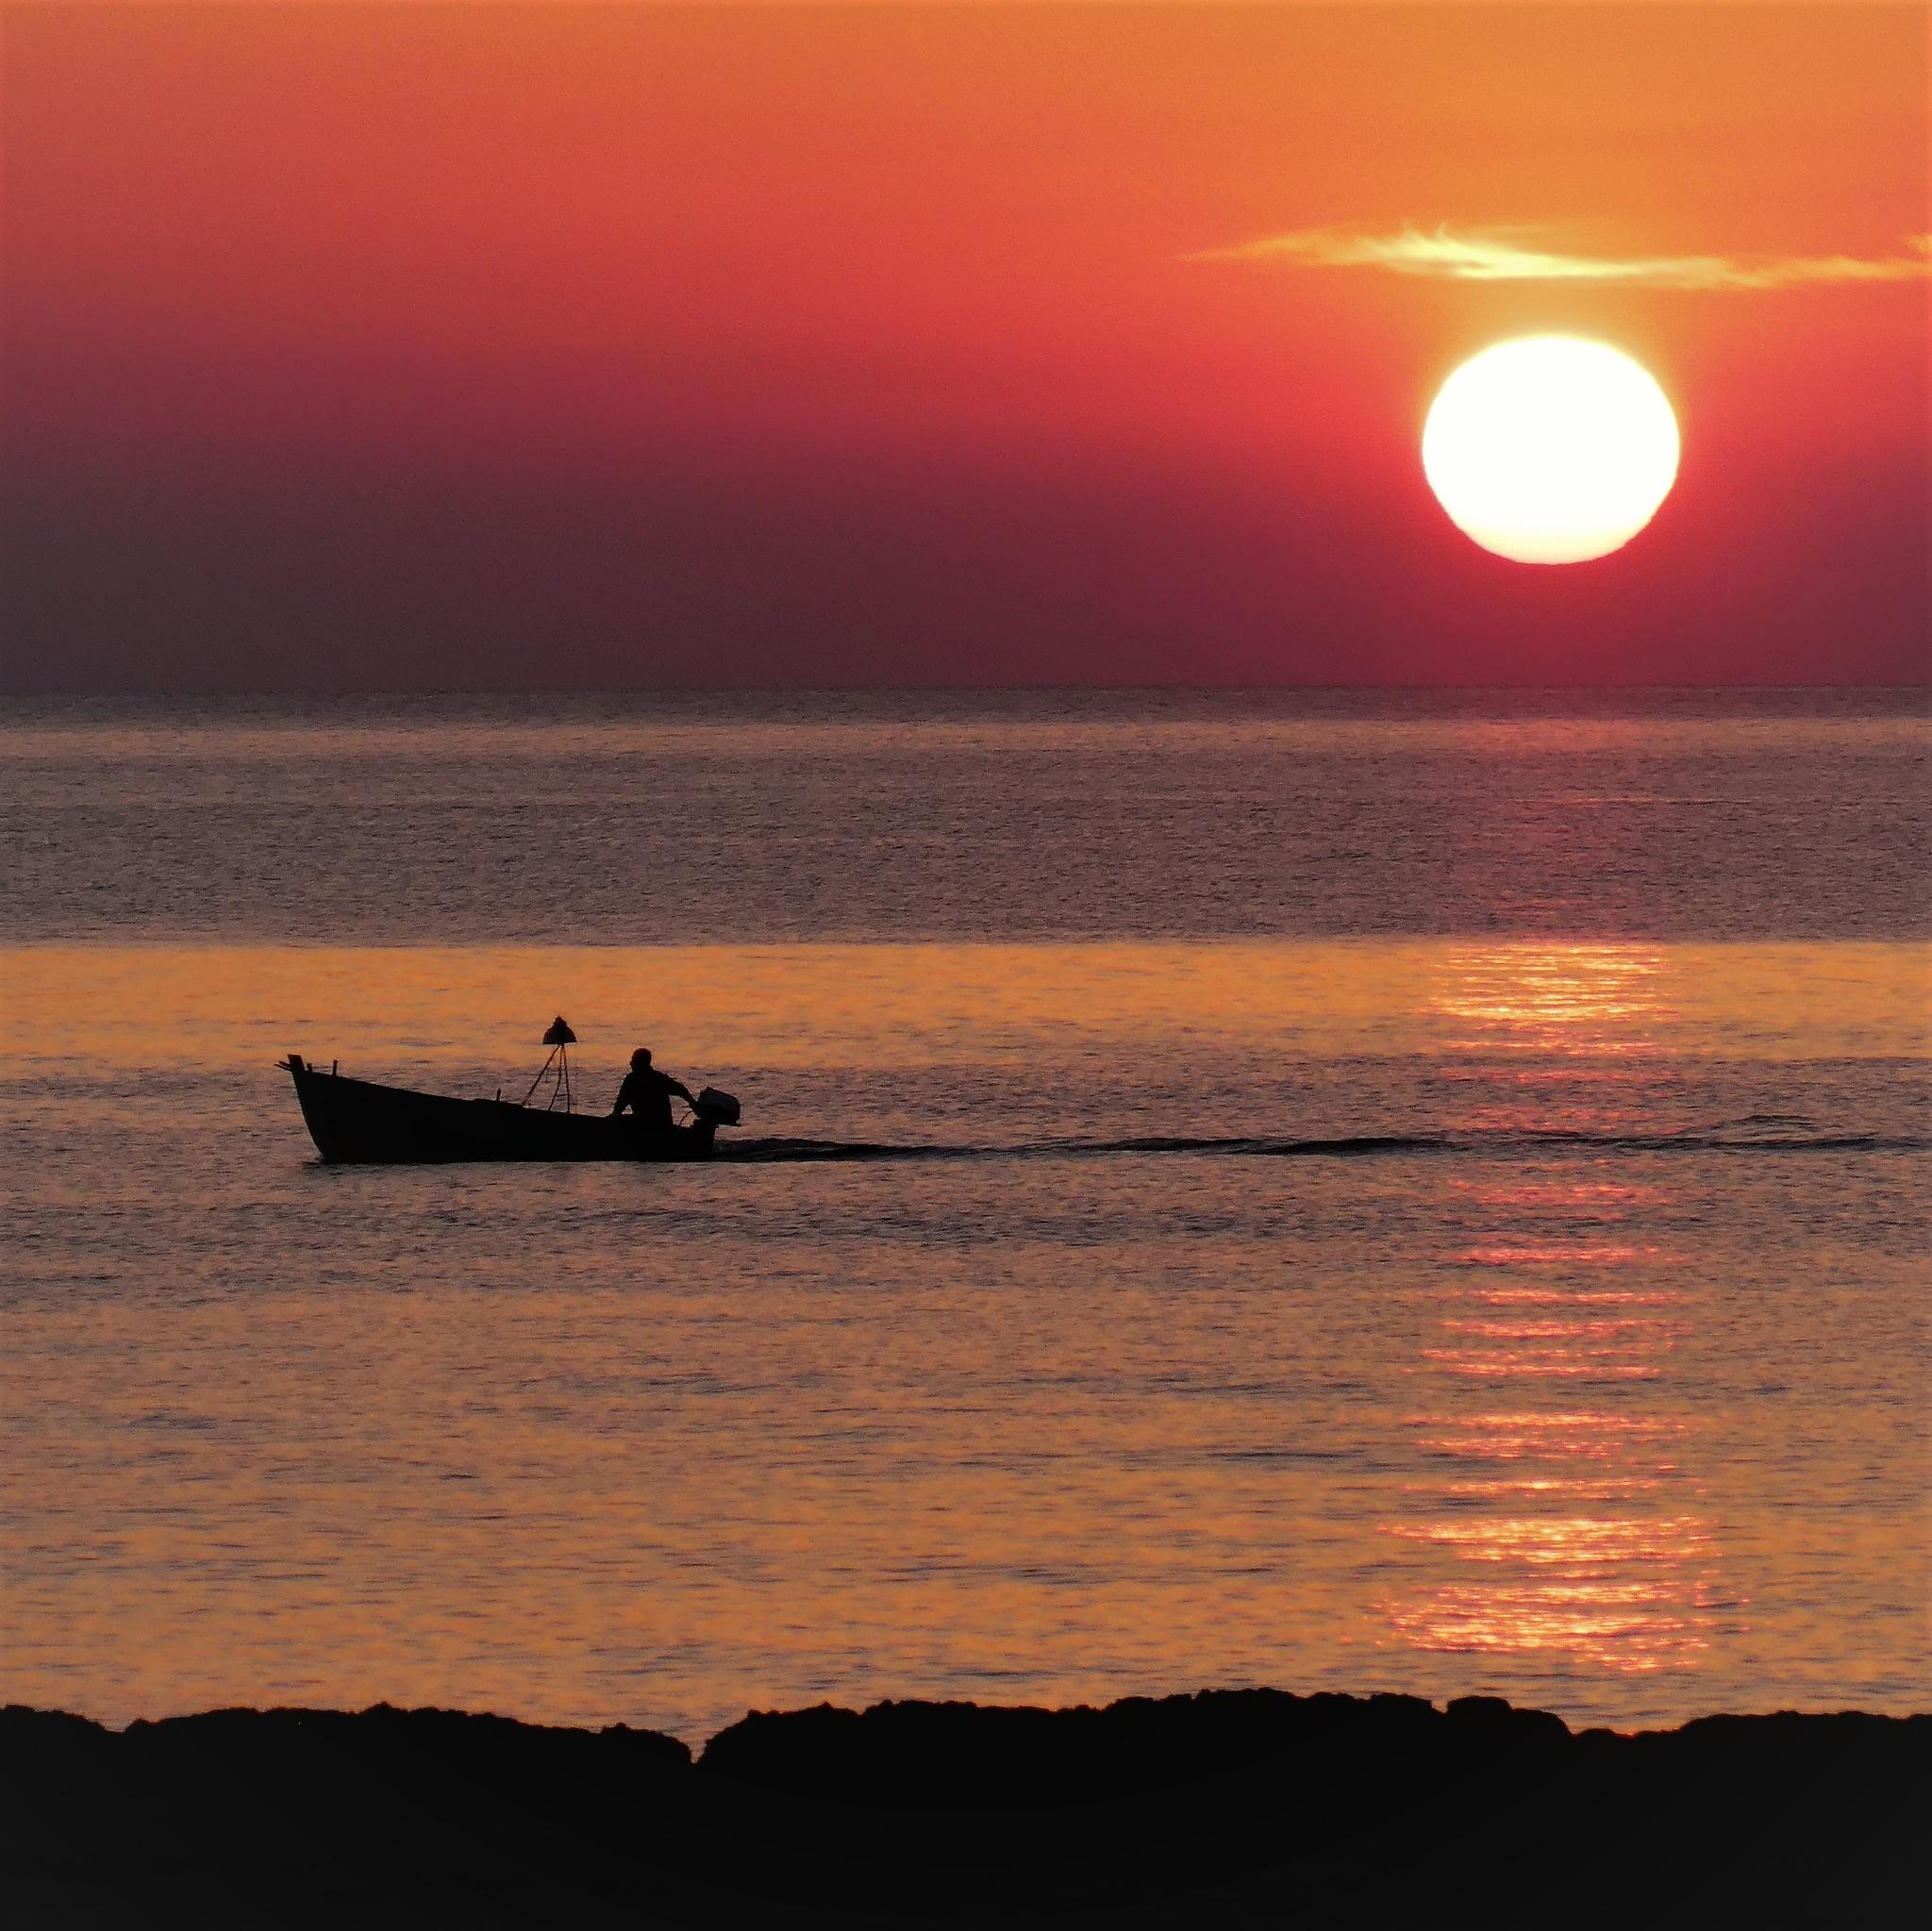 Early Morning Fisherman by Edualc Eznad